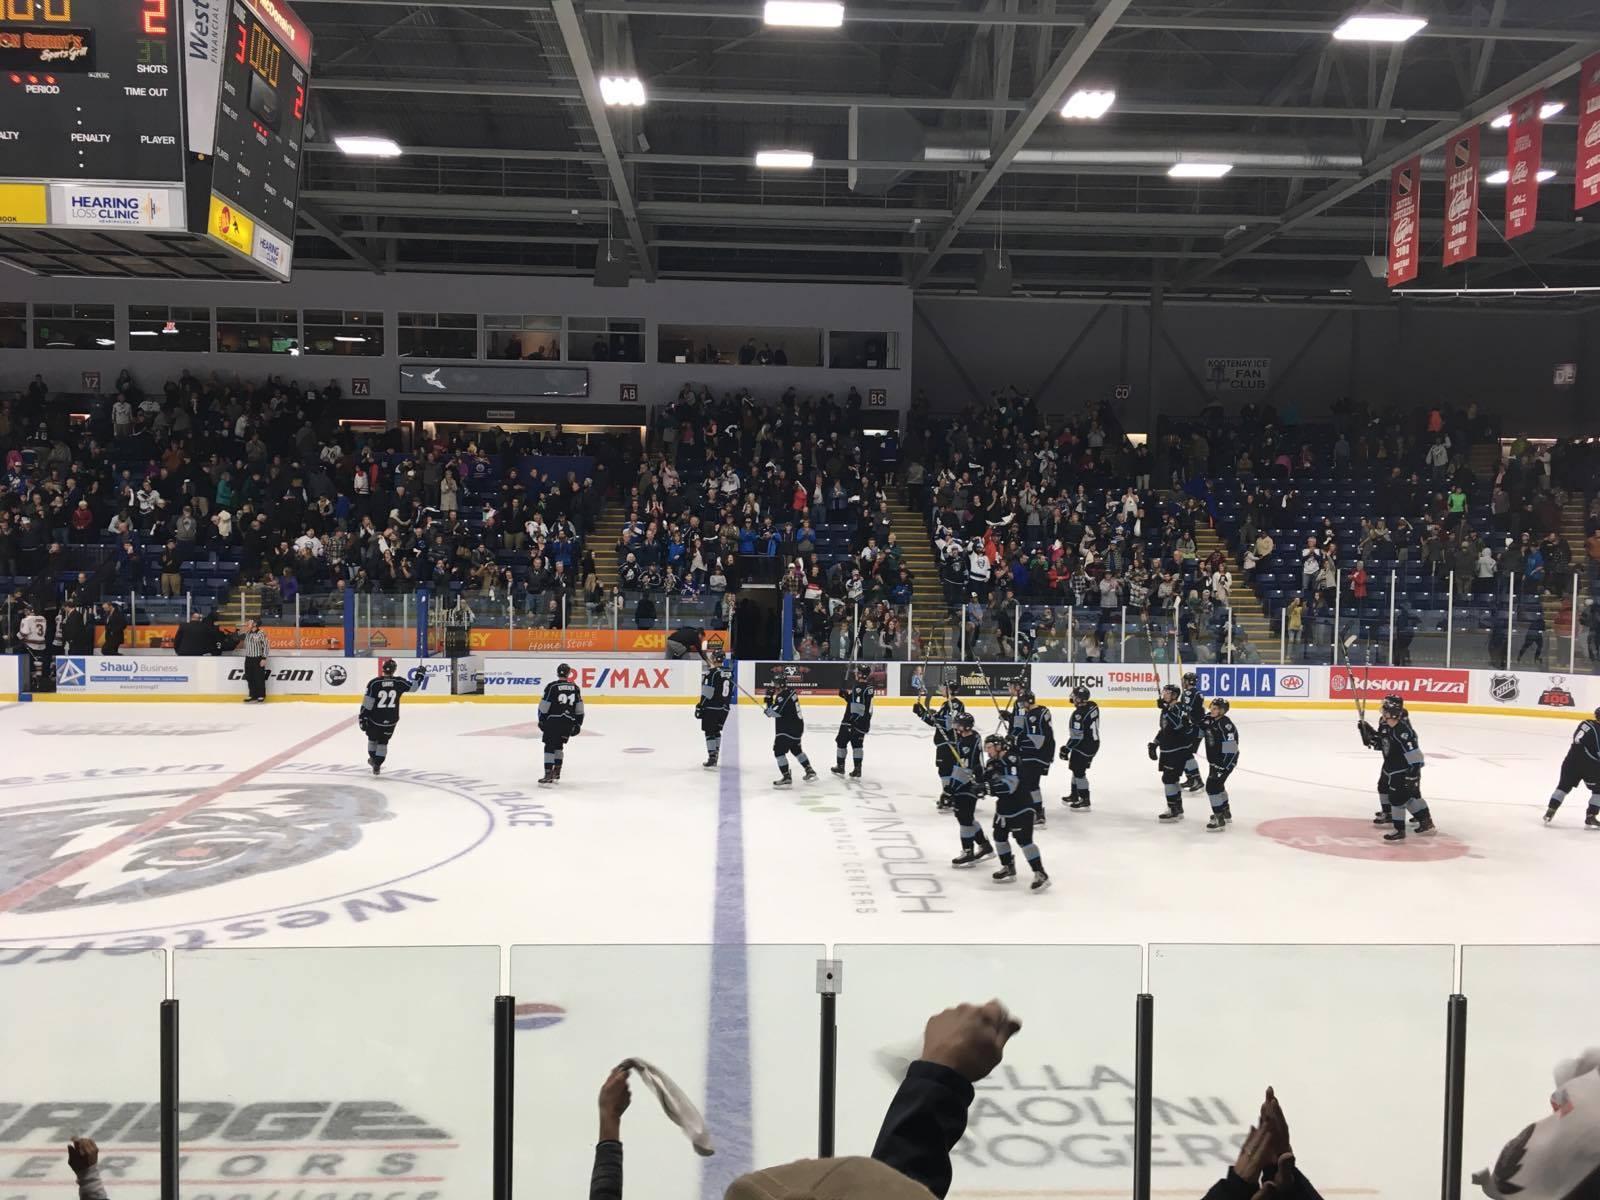 WHL: Kootenay tops Hitmen 3-2 to kickstart new ICE age